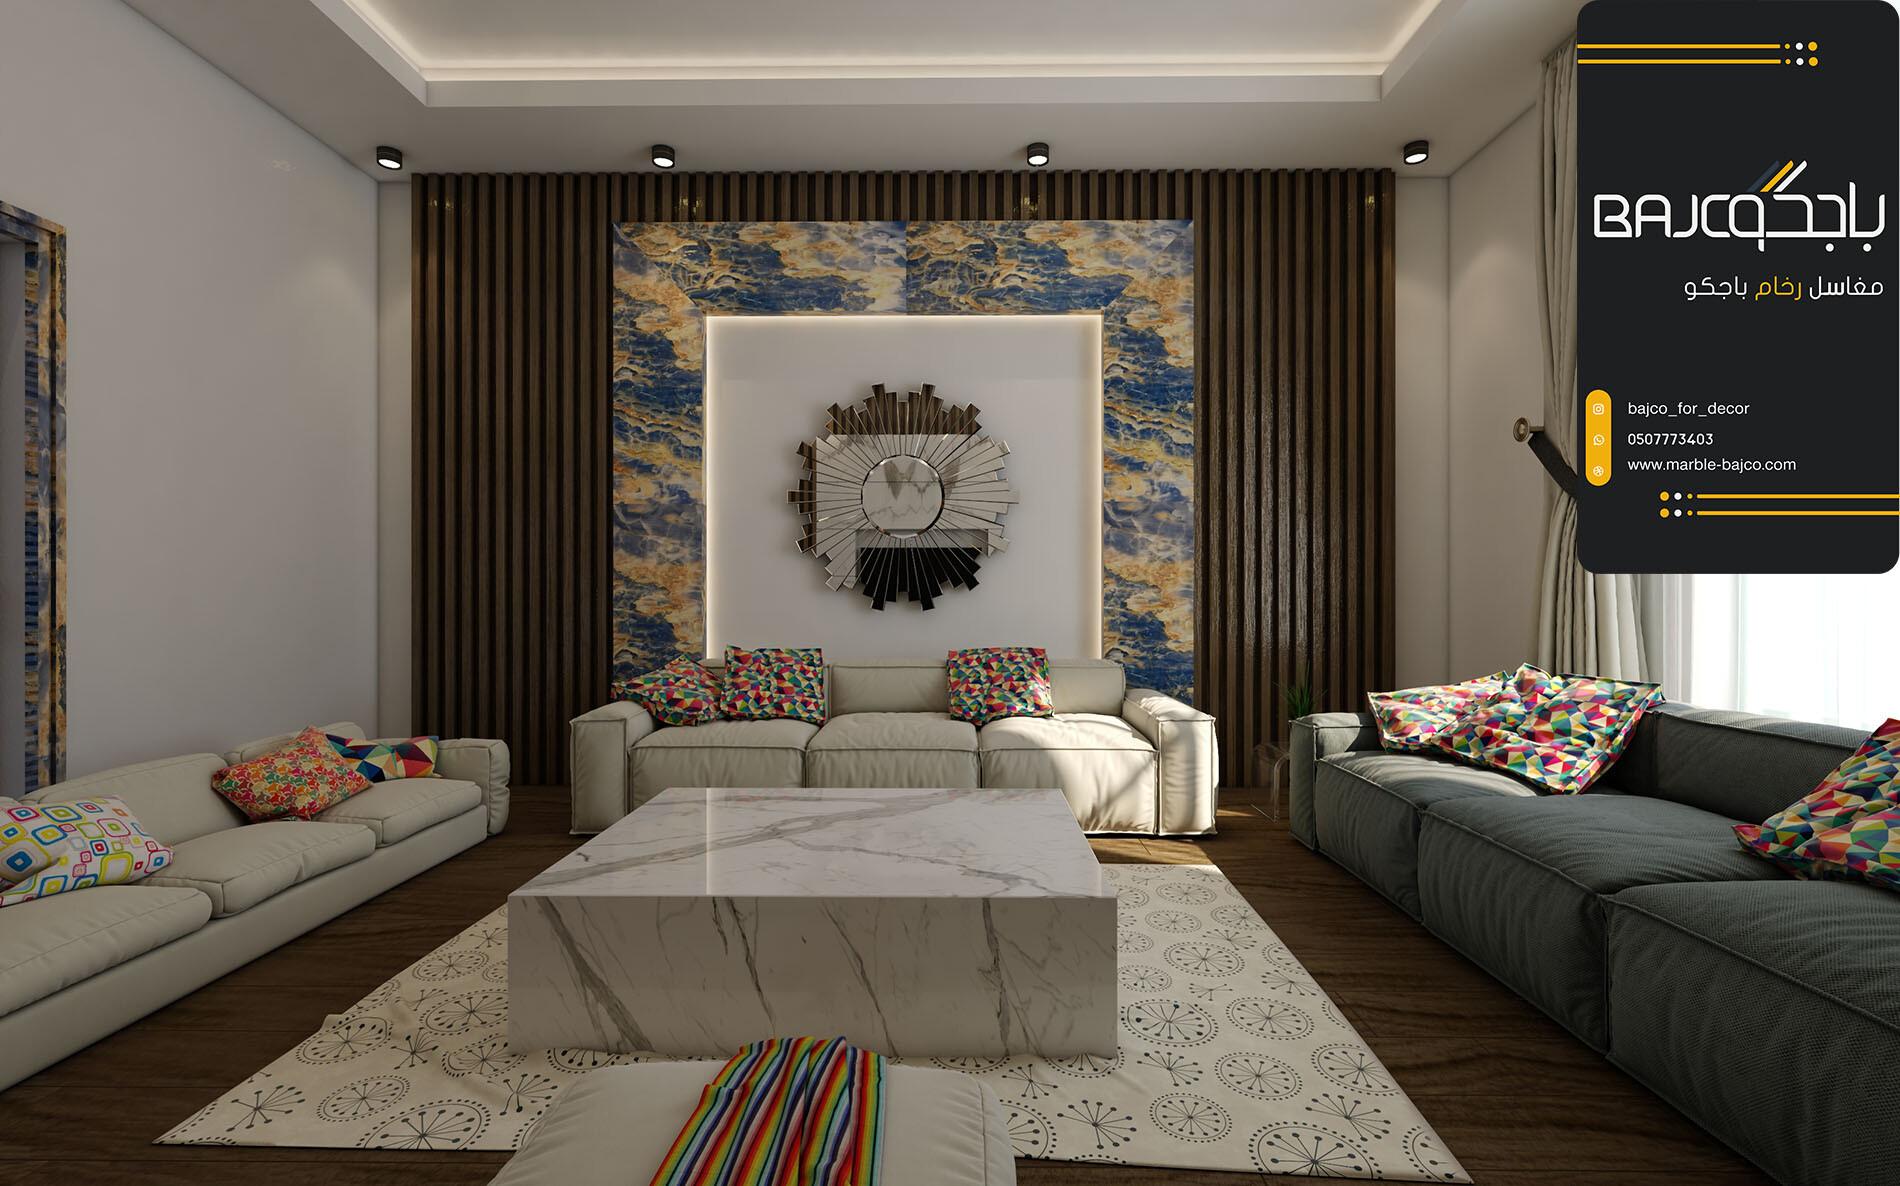 تصميم living room